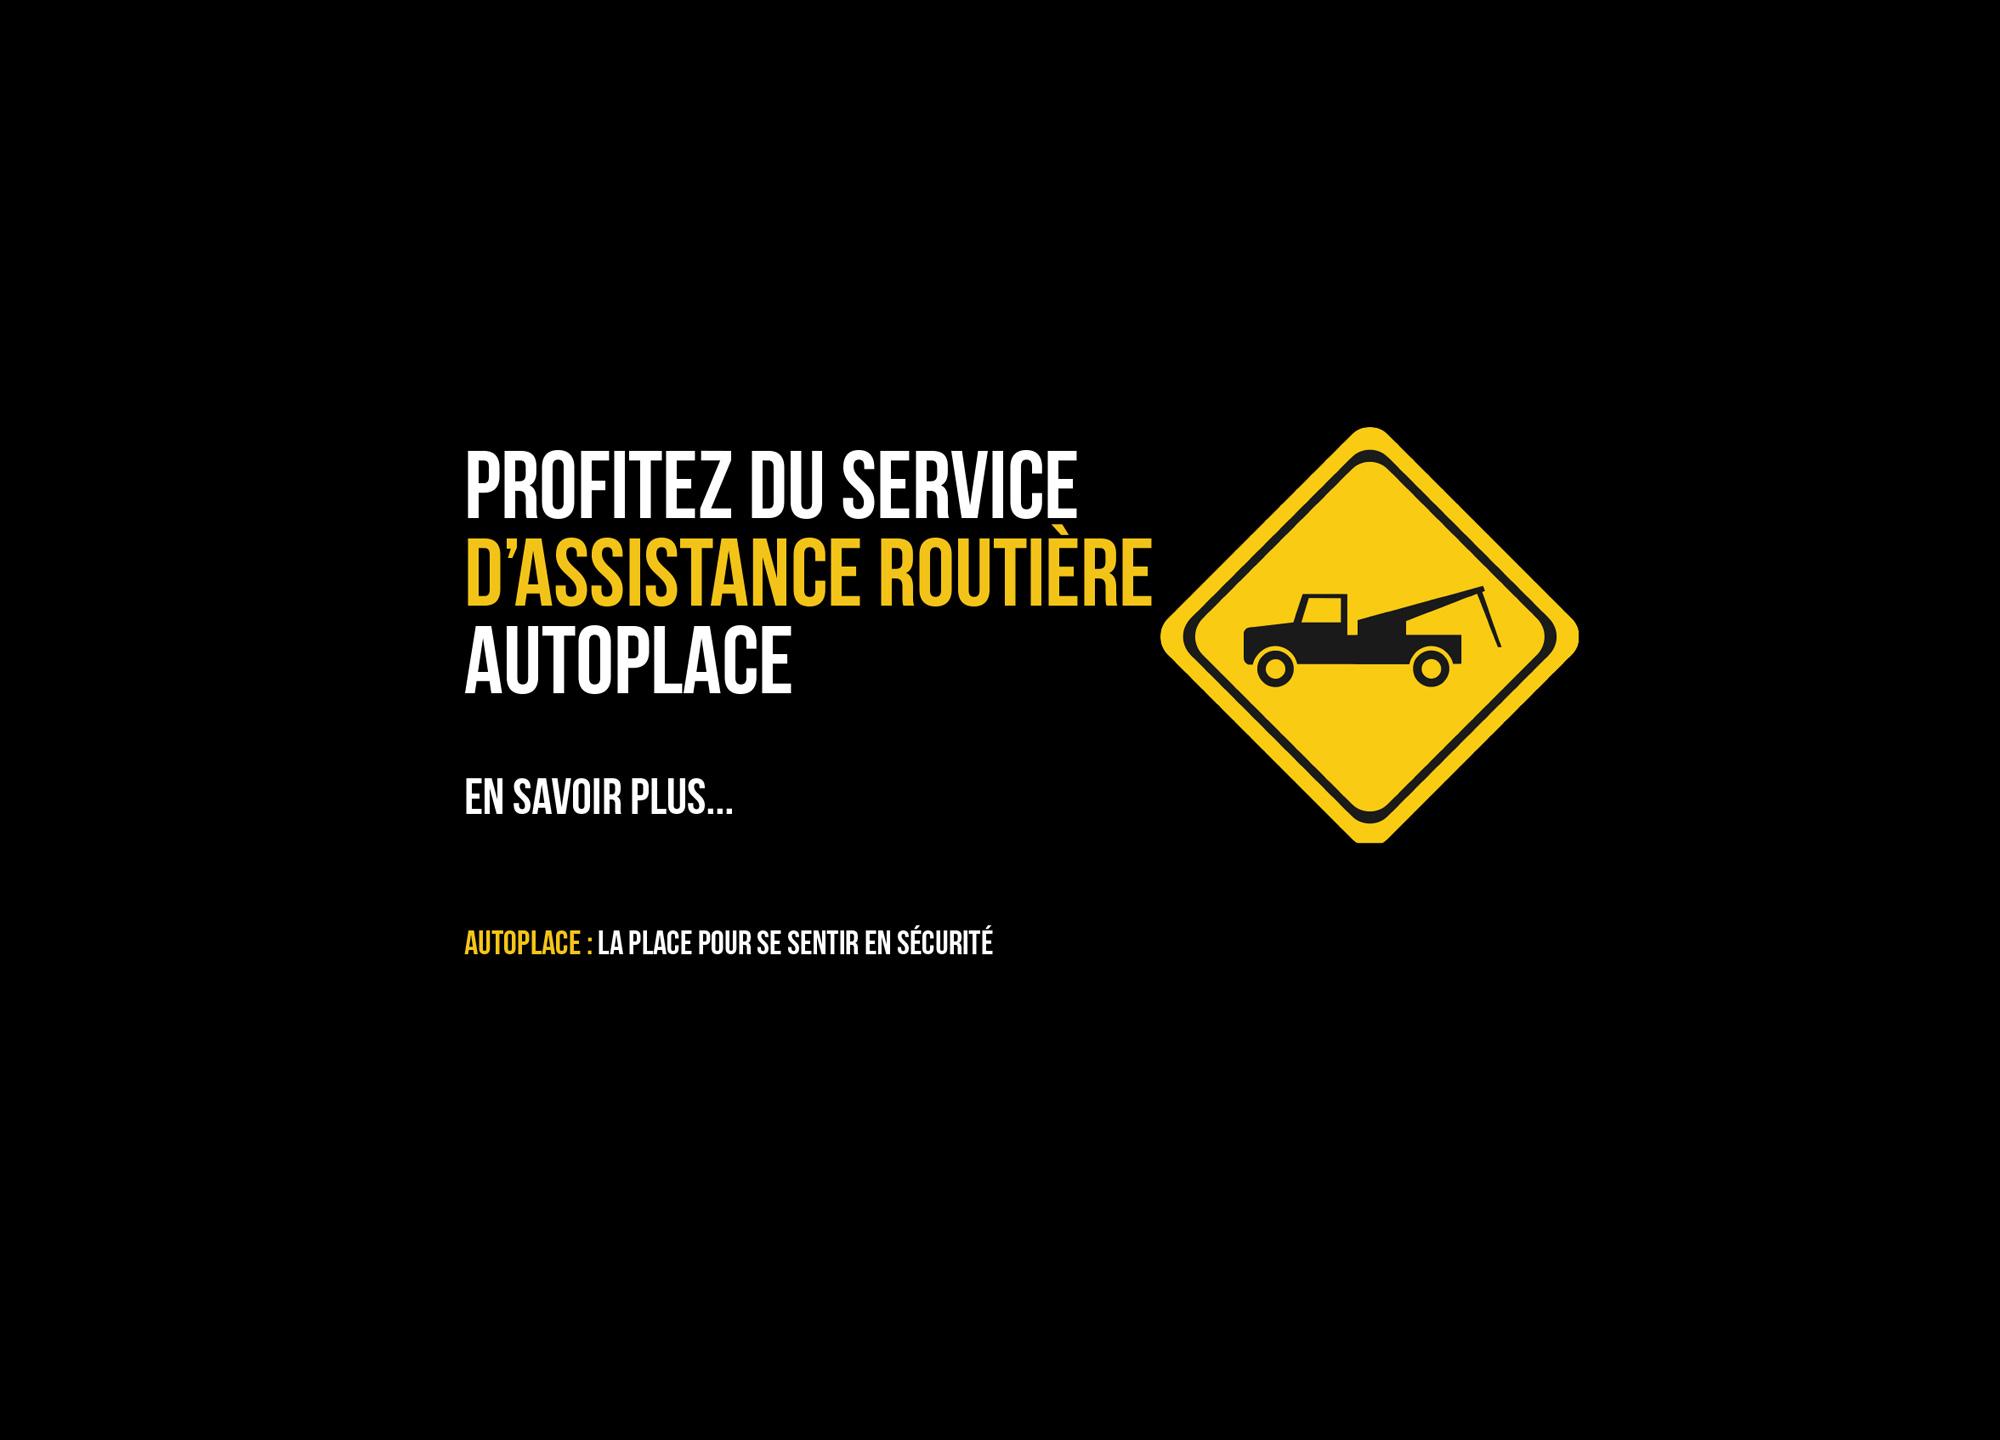 Assistance_routiere_accueil